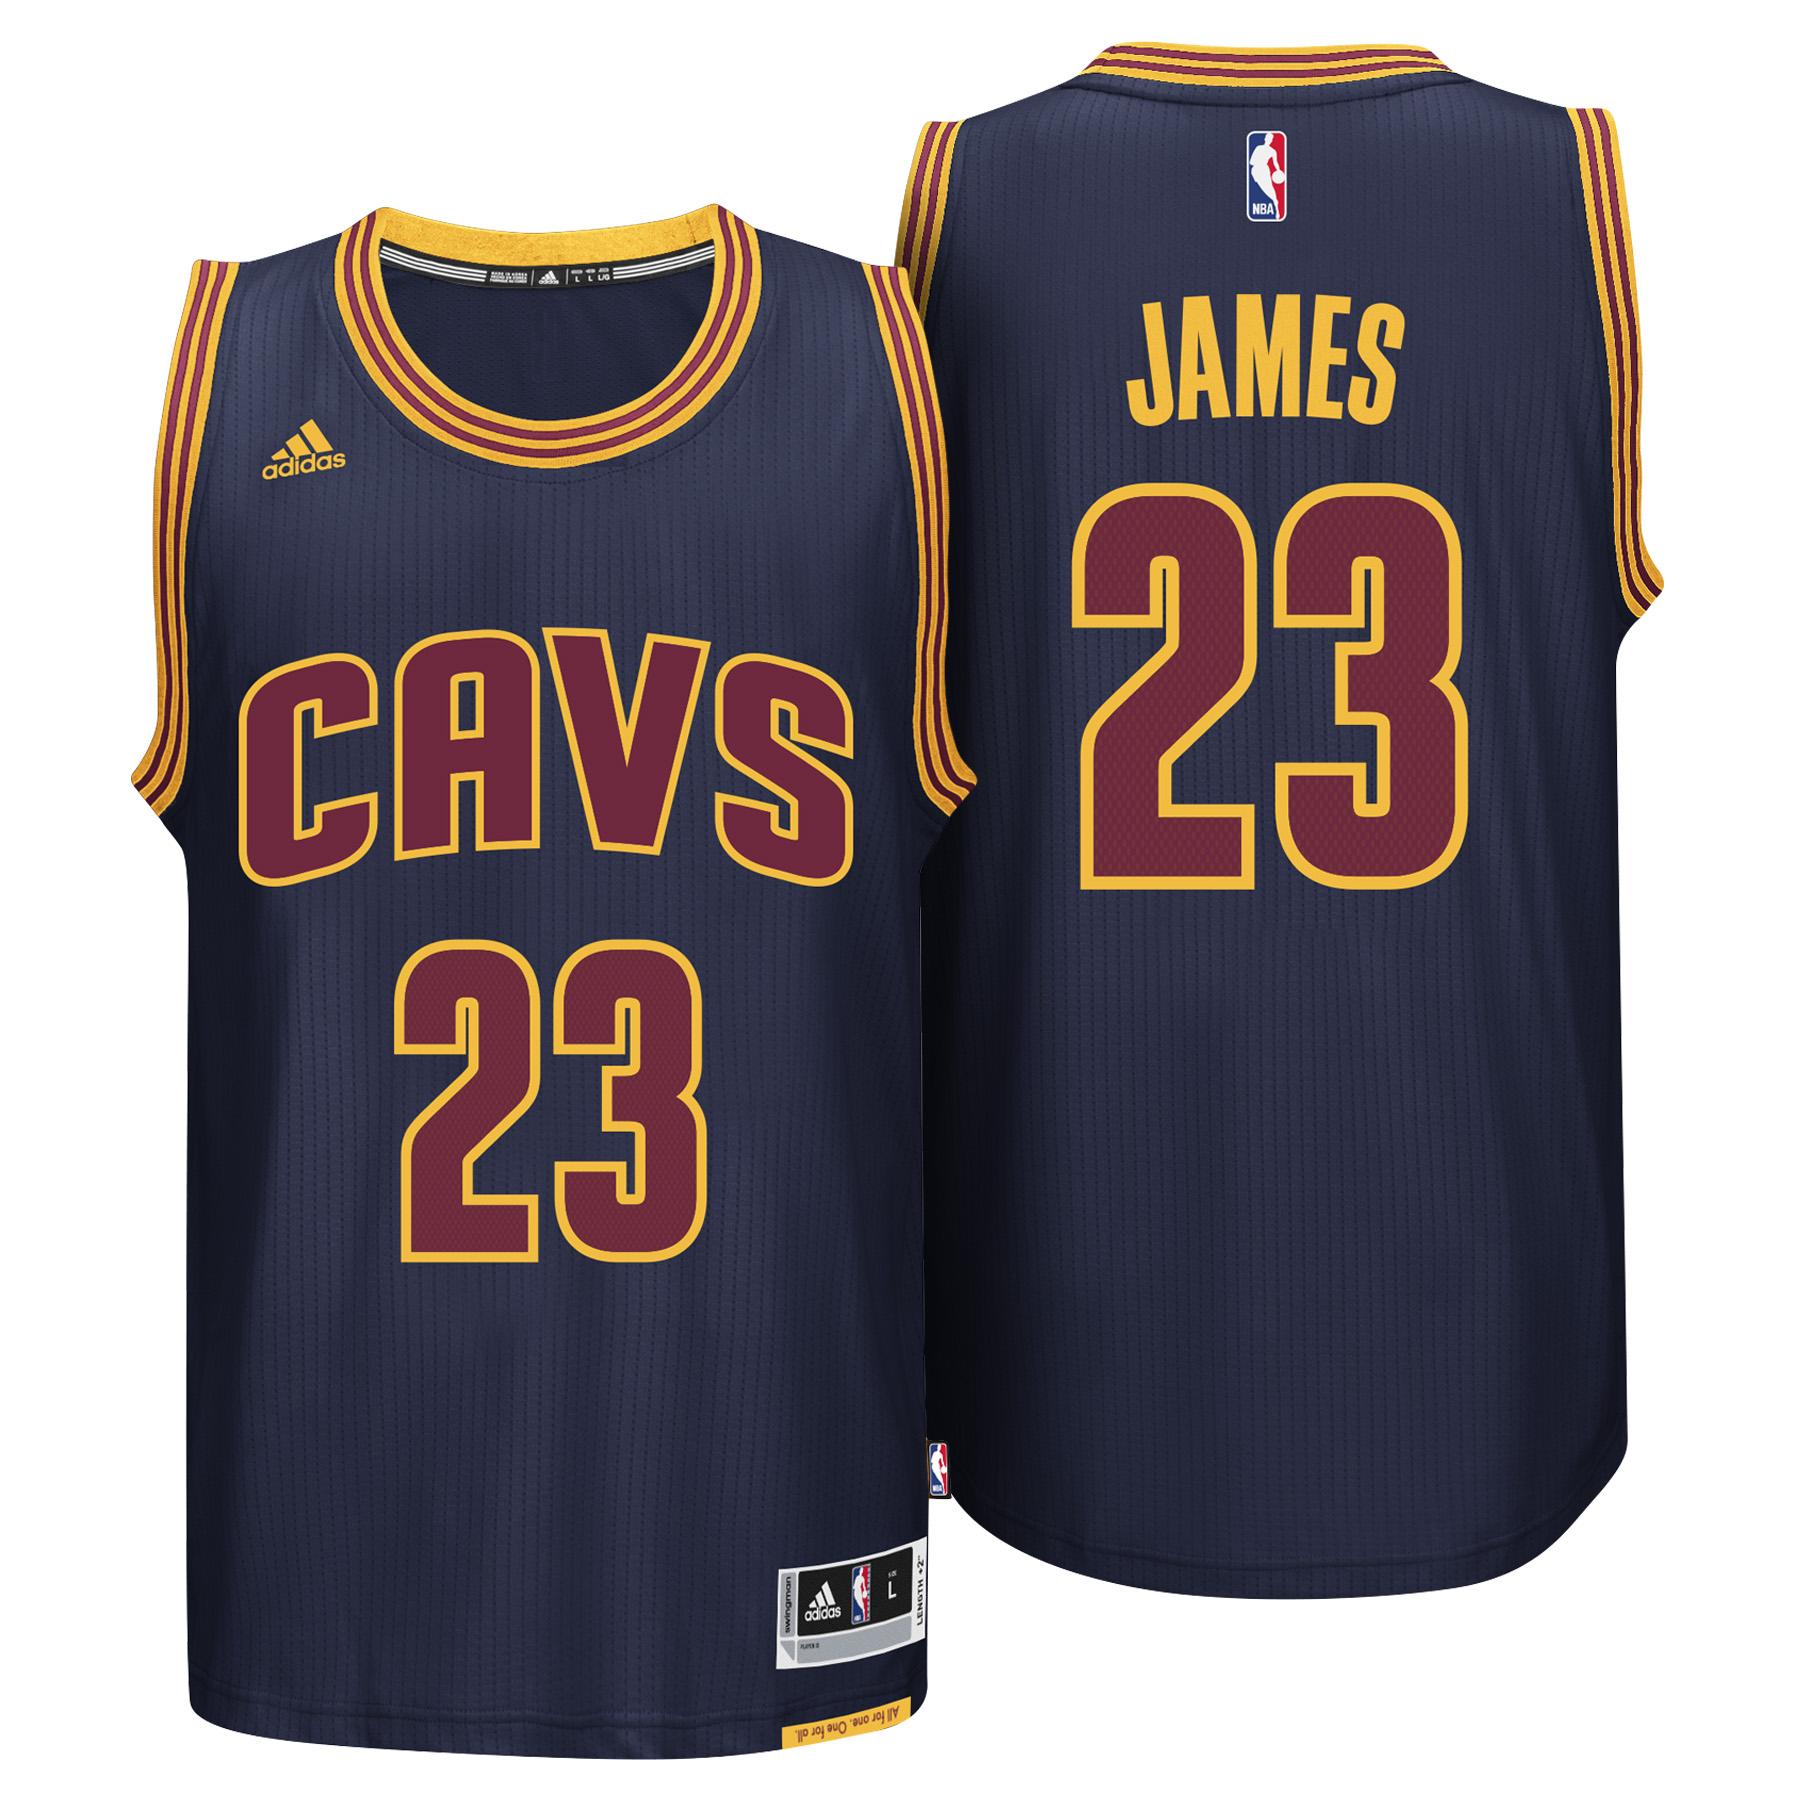 Cleveland Cavaliers Road Alternate Swingman Jersey - Lebron James - Yo